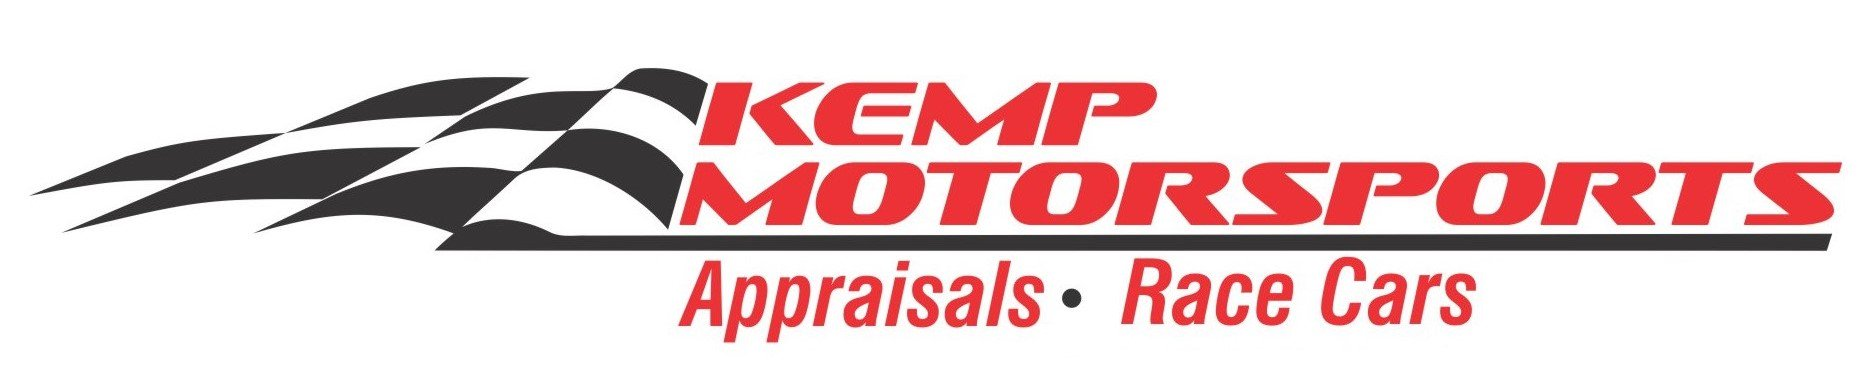 Kemp Motorsports